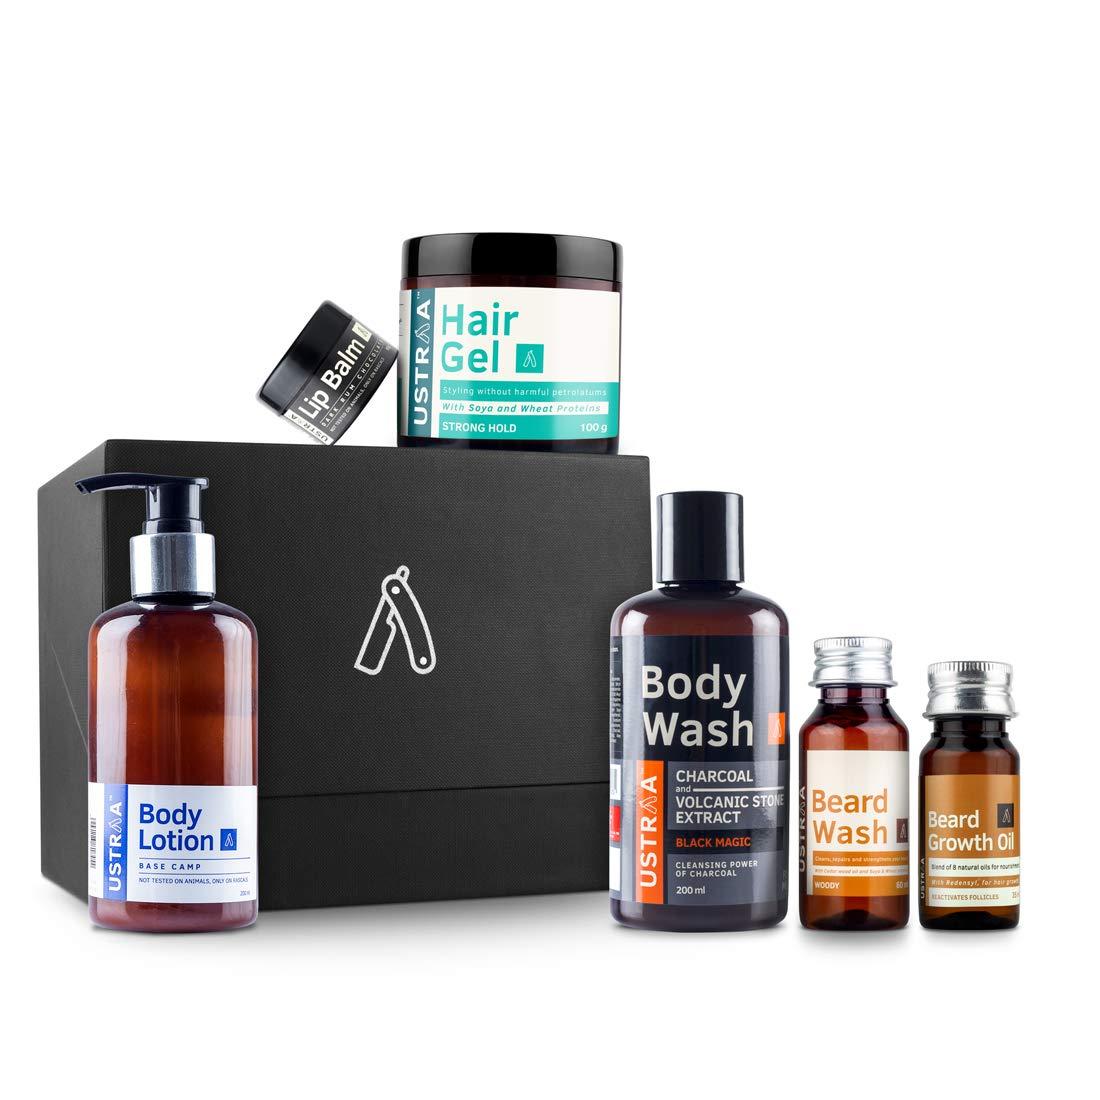 Ustraa Gift For Men (Beard Growth Oil, Beard Wash, Body